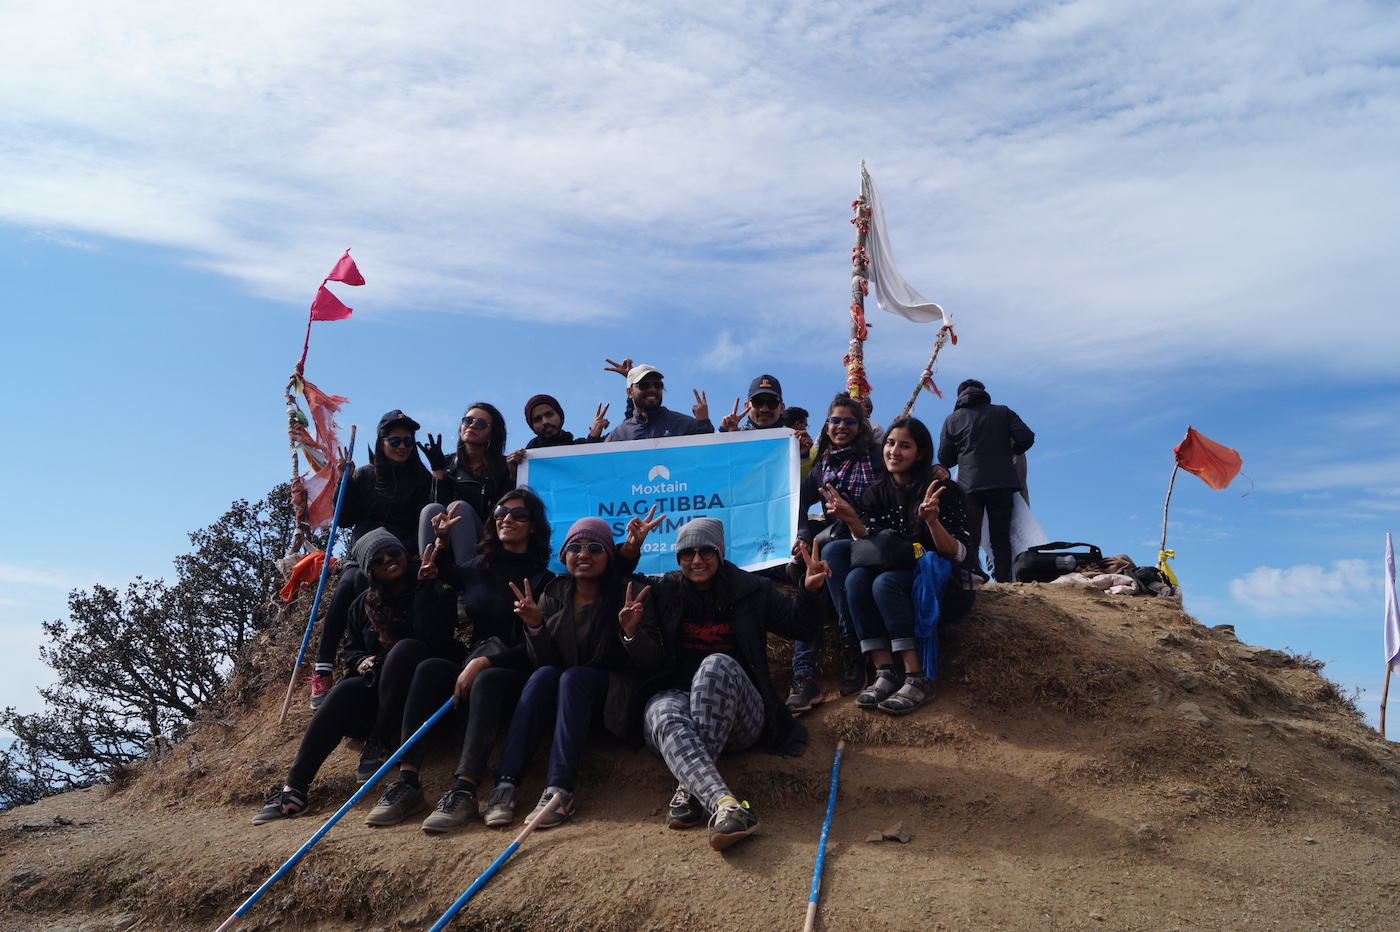 nag tibba summit